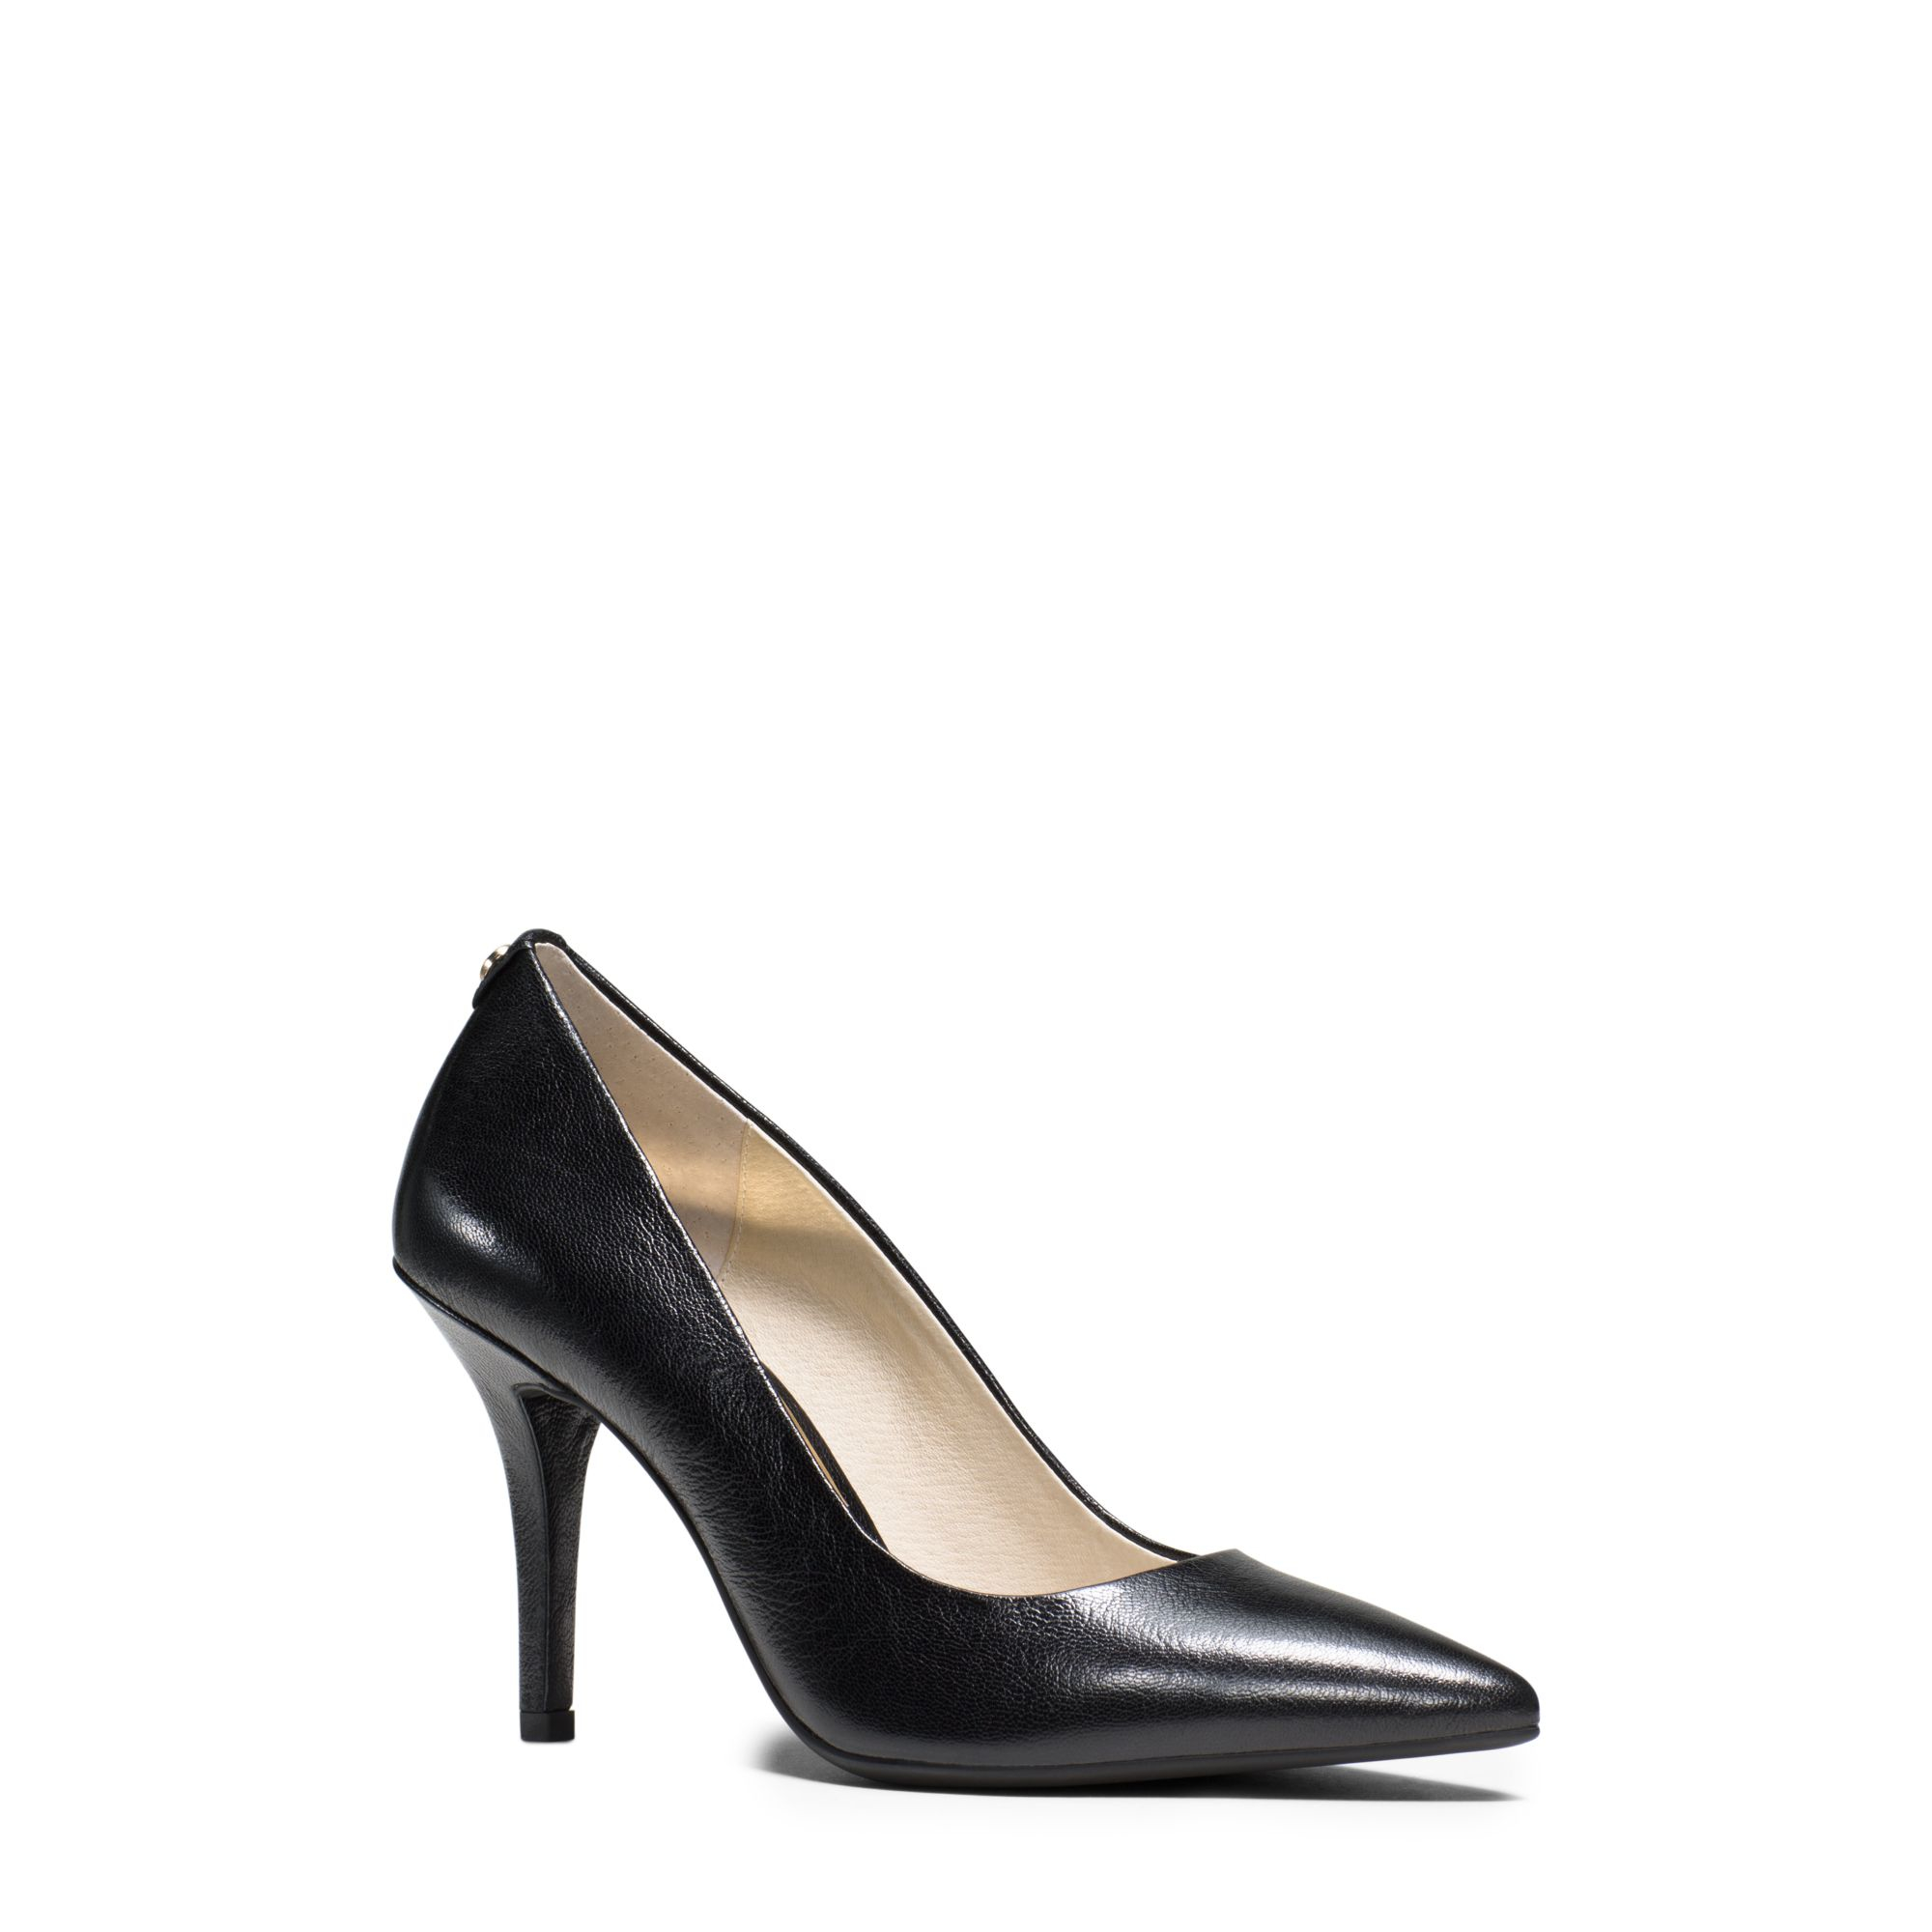 michael kors flex leather high heel pump in black lyst. Black Bedroom Furniture Sets. Home Design Ideas